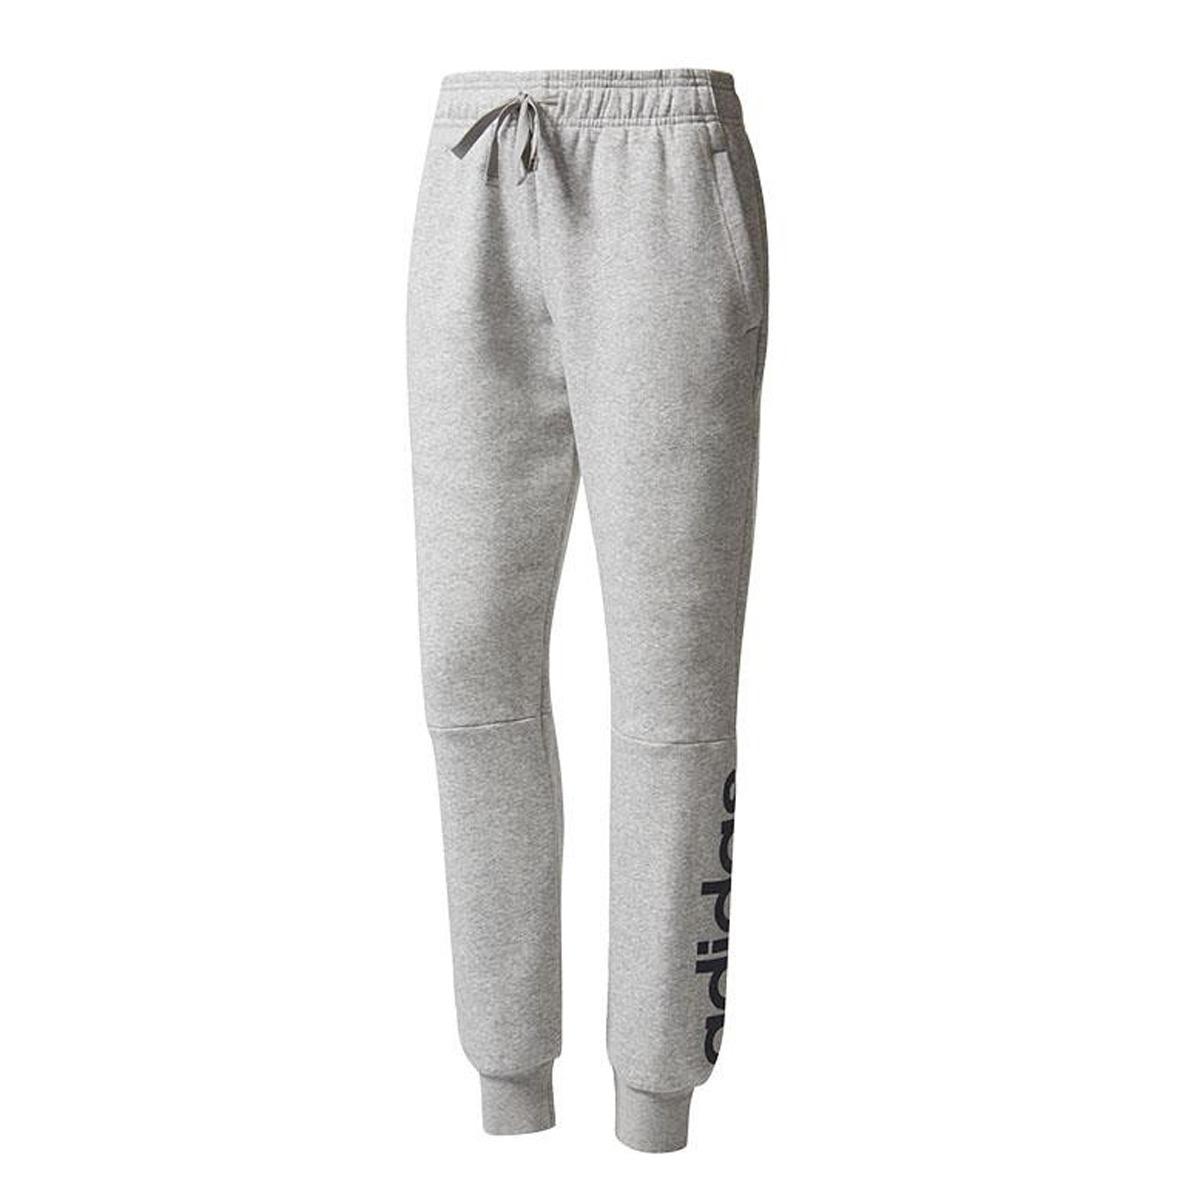 839 Linear Adidas Pantalon En 00 Mujer Gr Training Essentials vSn1q